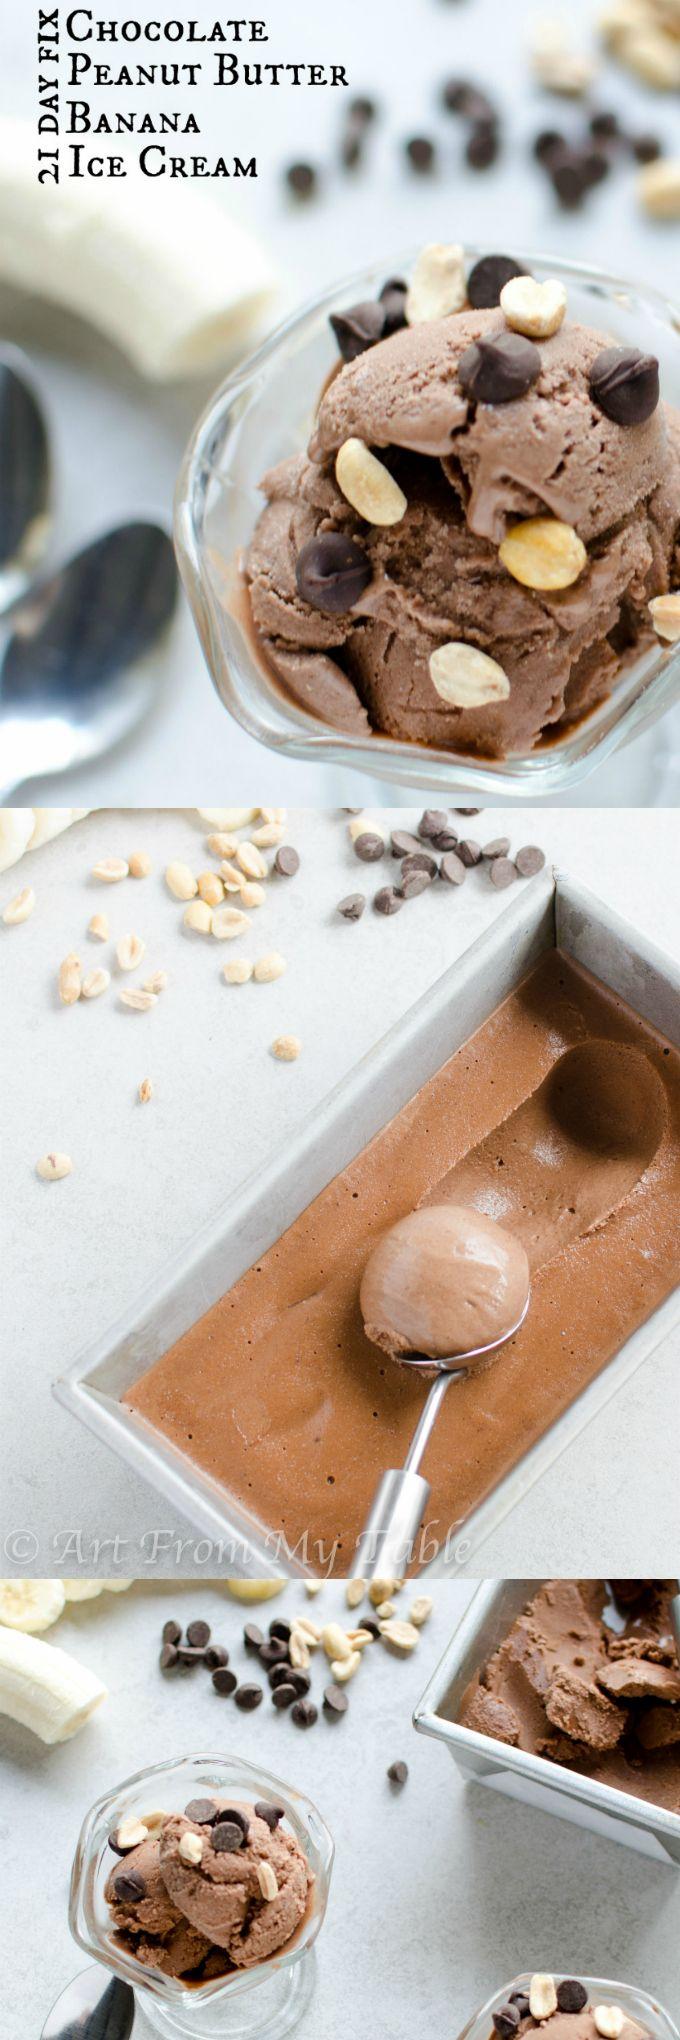 21 Day Fix Chocolate Peanut Butter Banana Ice Cream